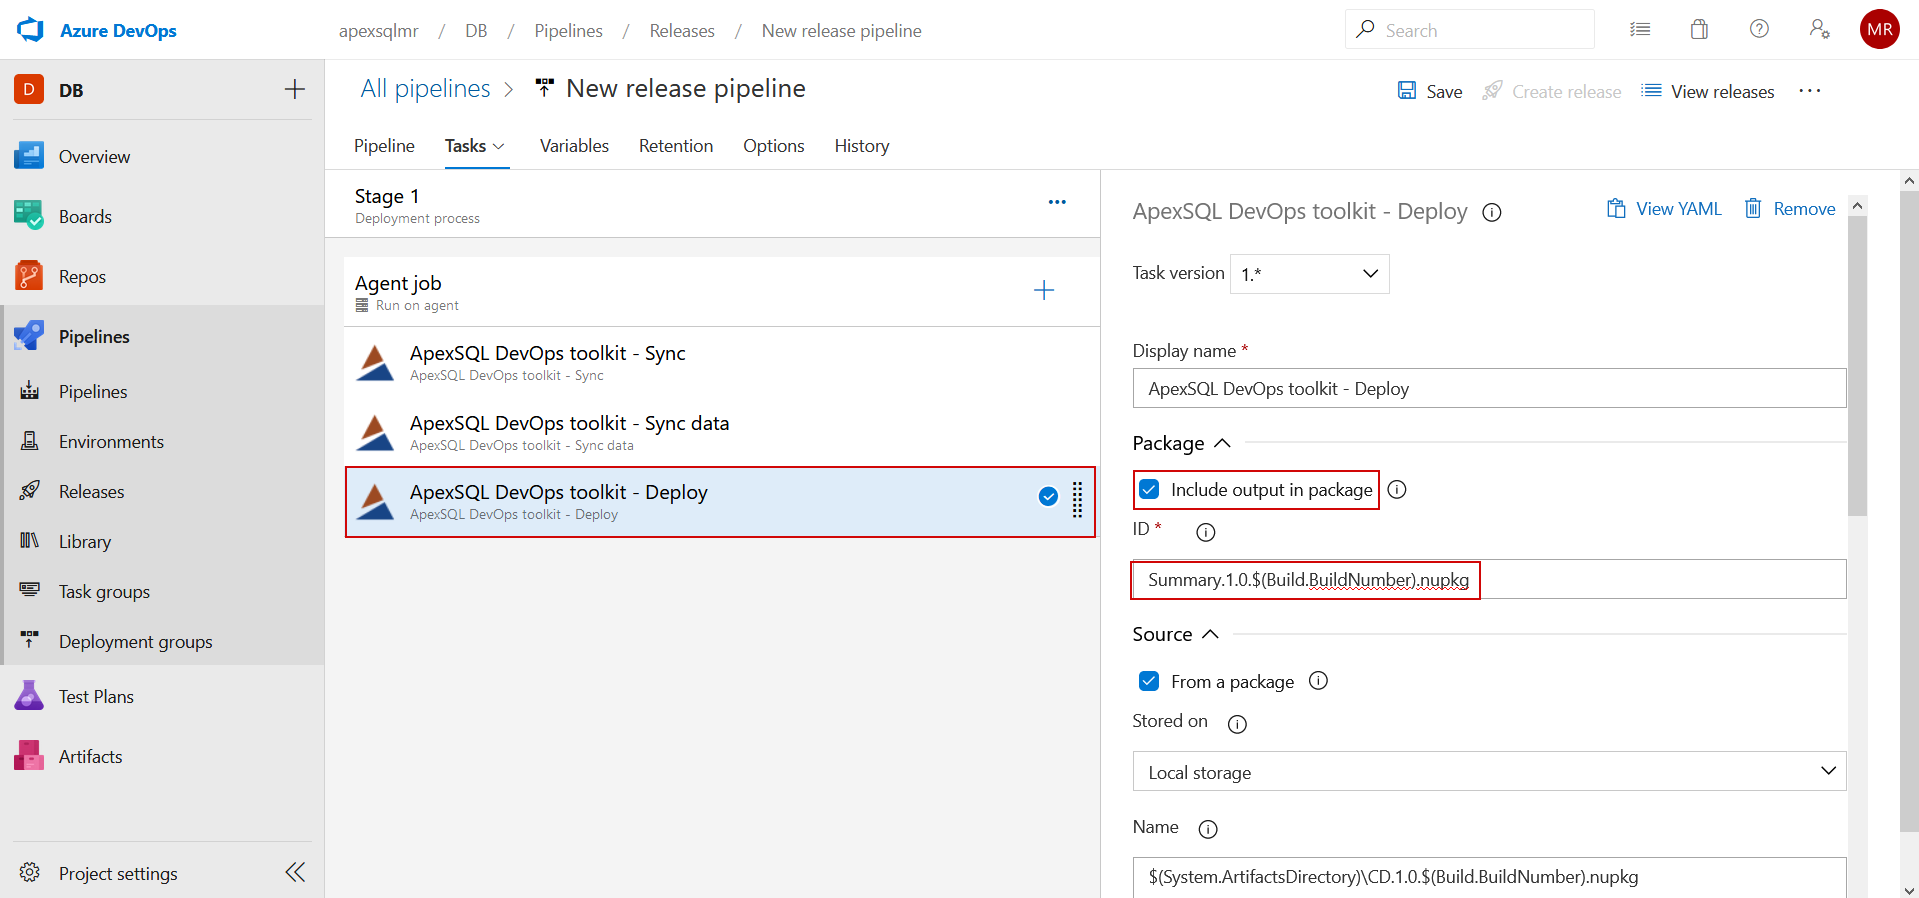 ApexSQL DevOps toolkit - Deploy task NuGet output definition